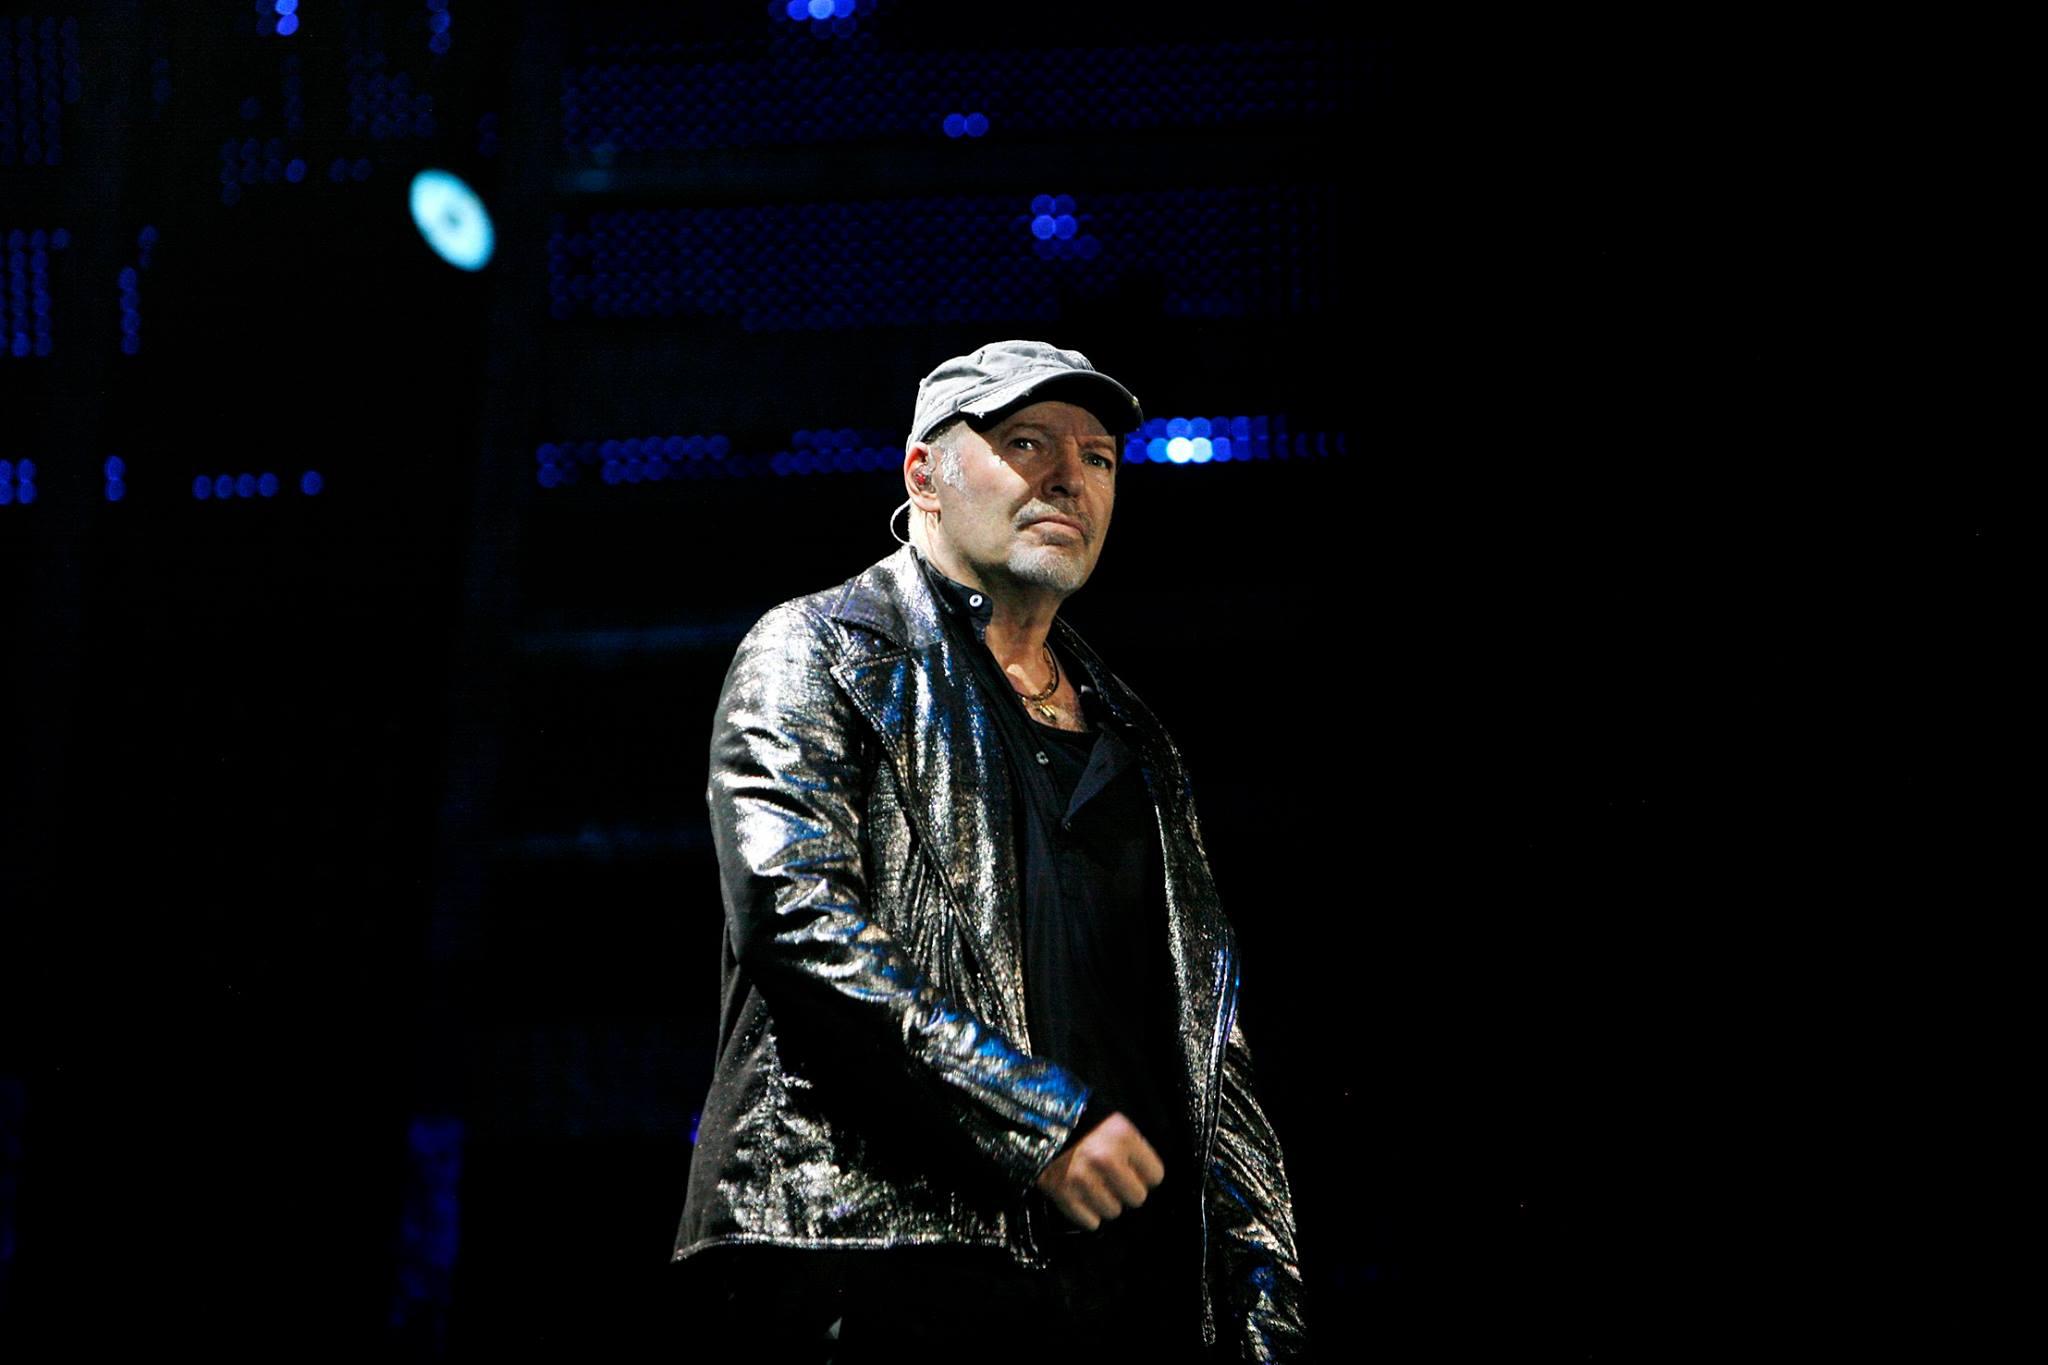 Concerto vasco rossi modena 2017 data ufficiale for Vasi rossi